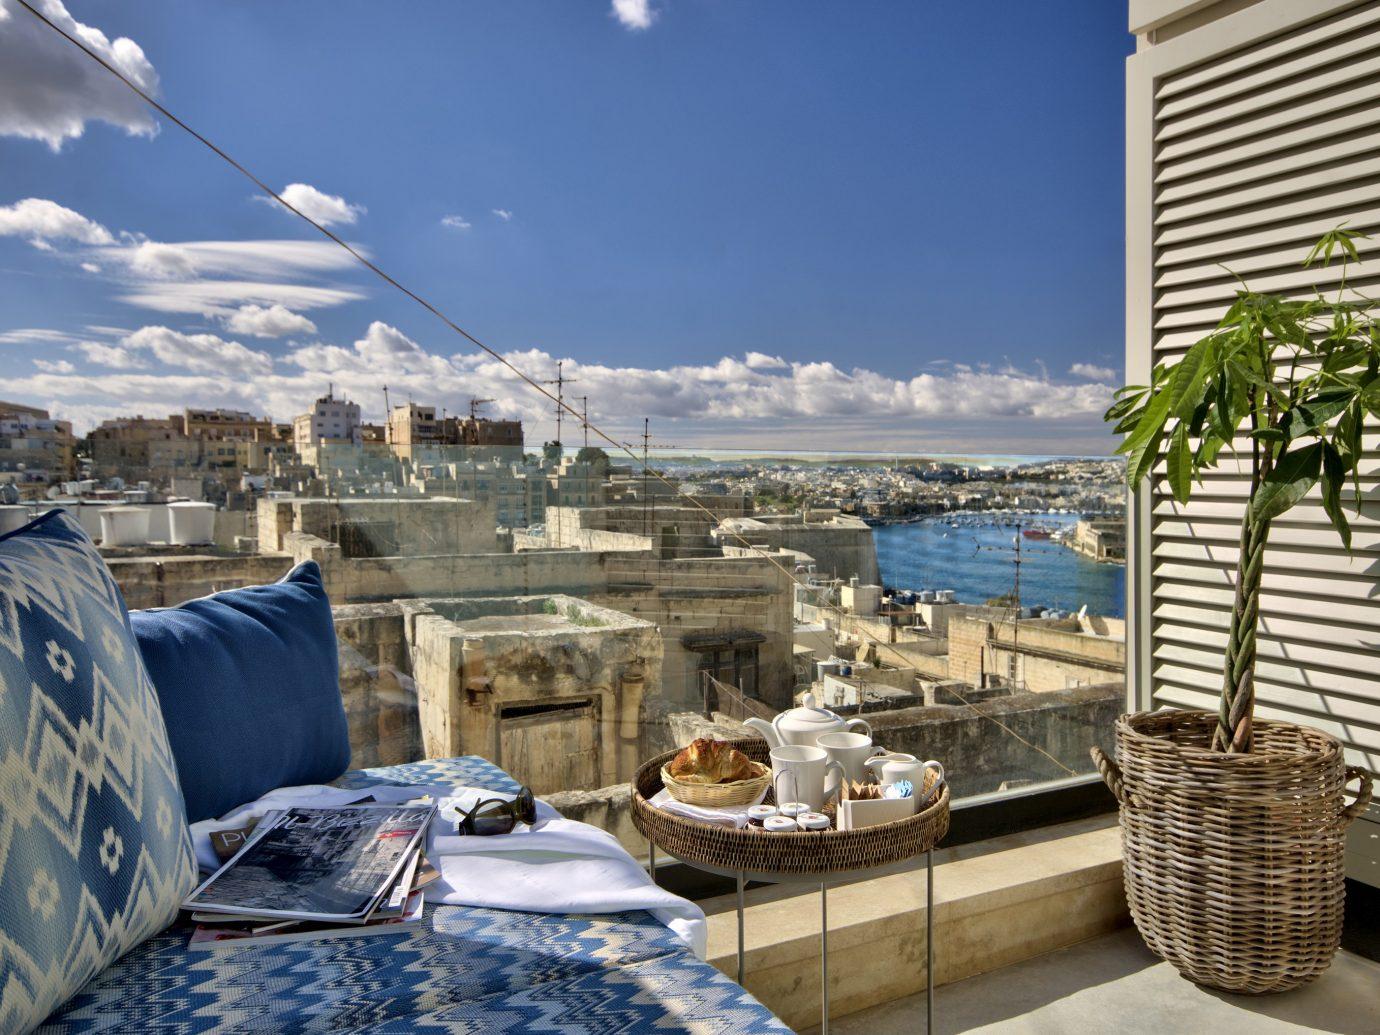 Hotels vacation estate Resort Sea travel